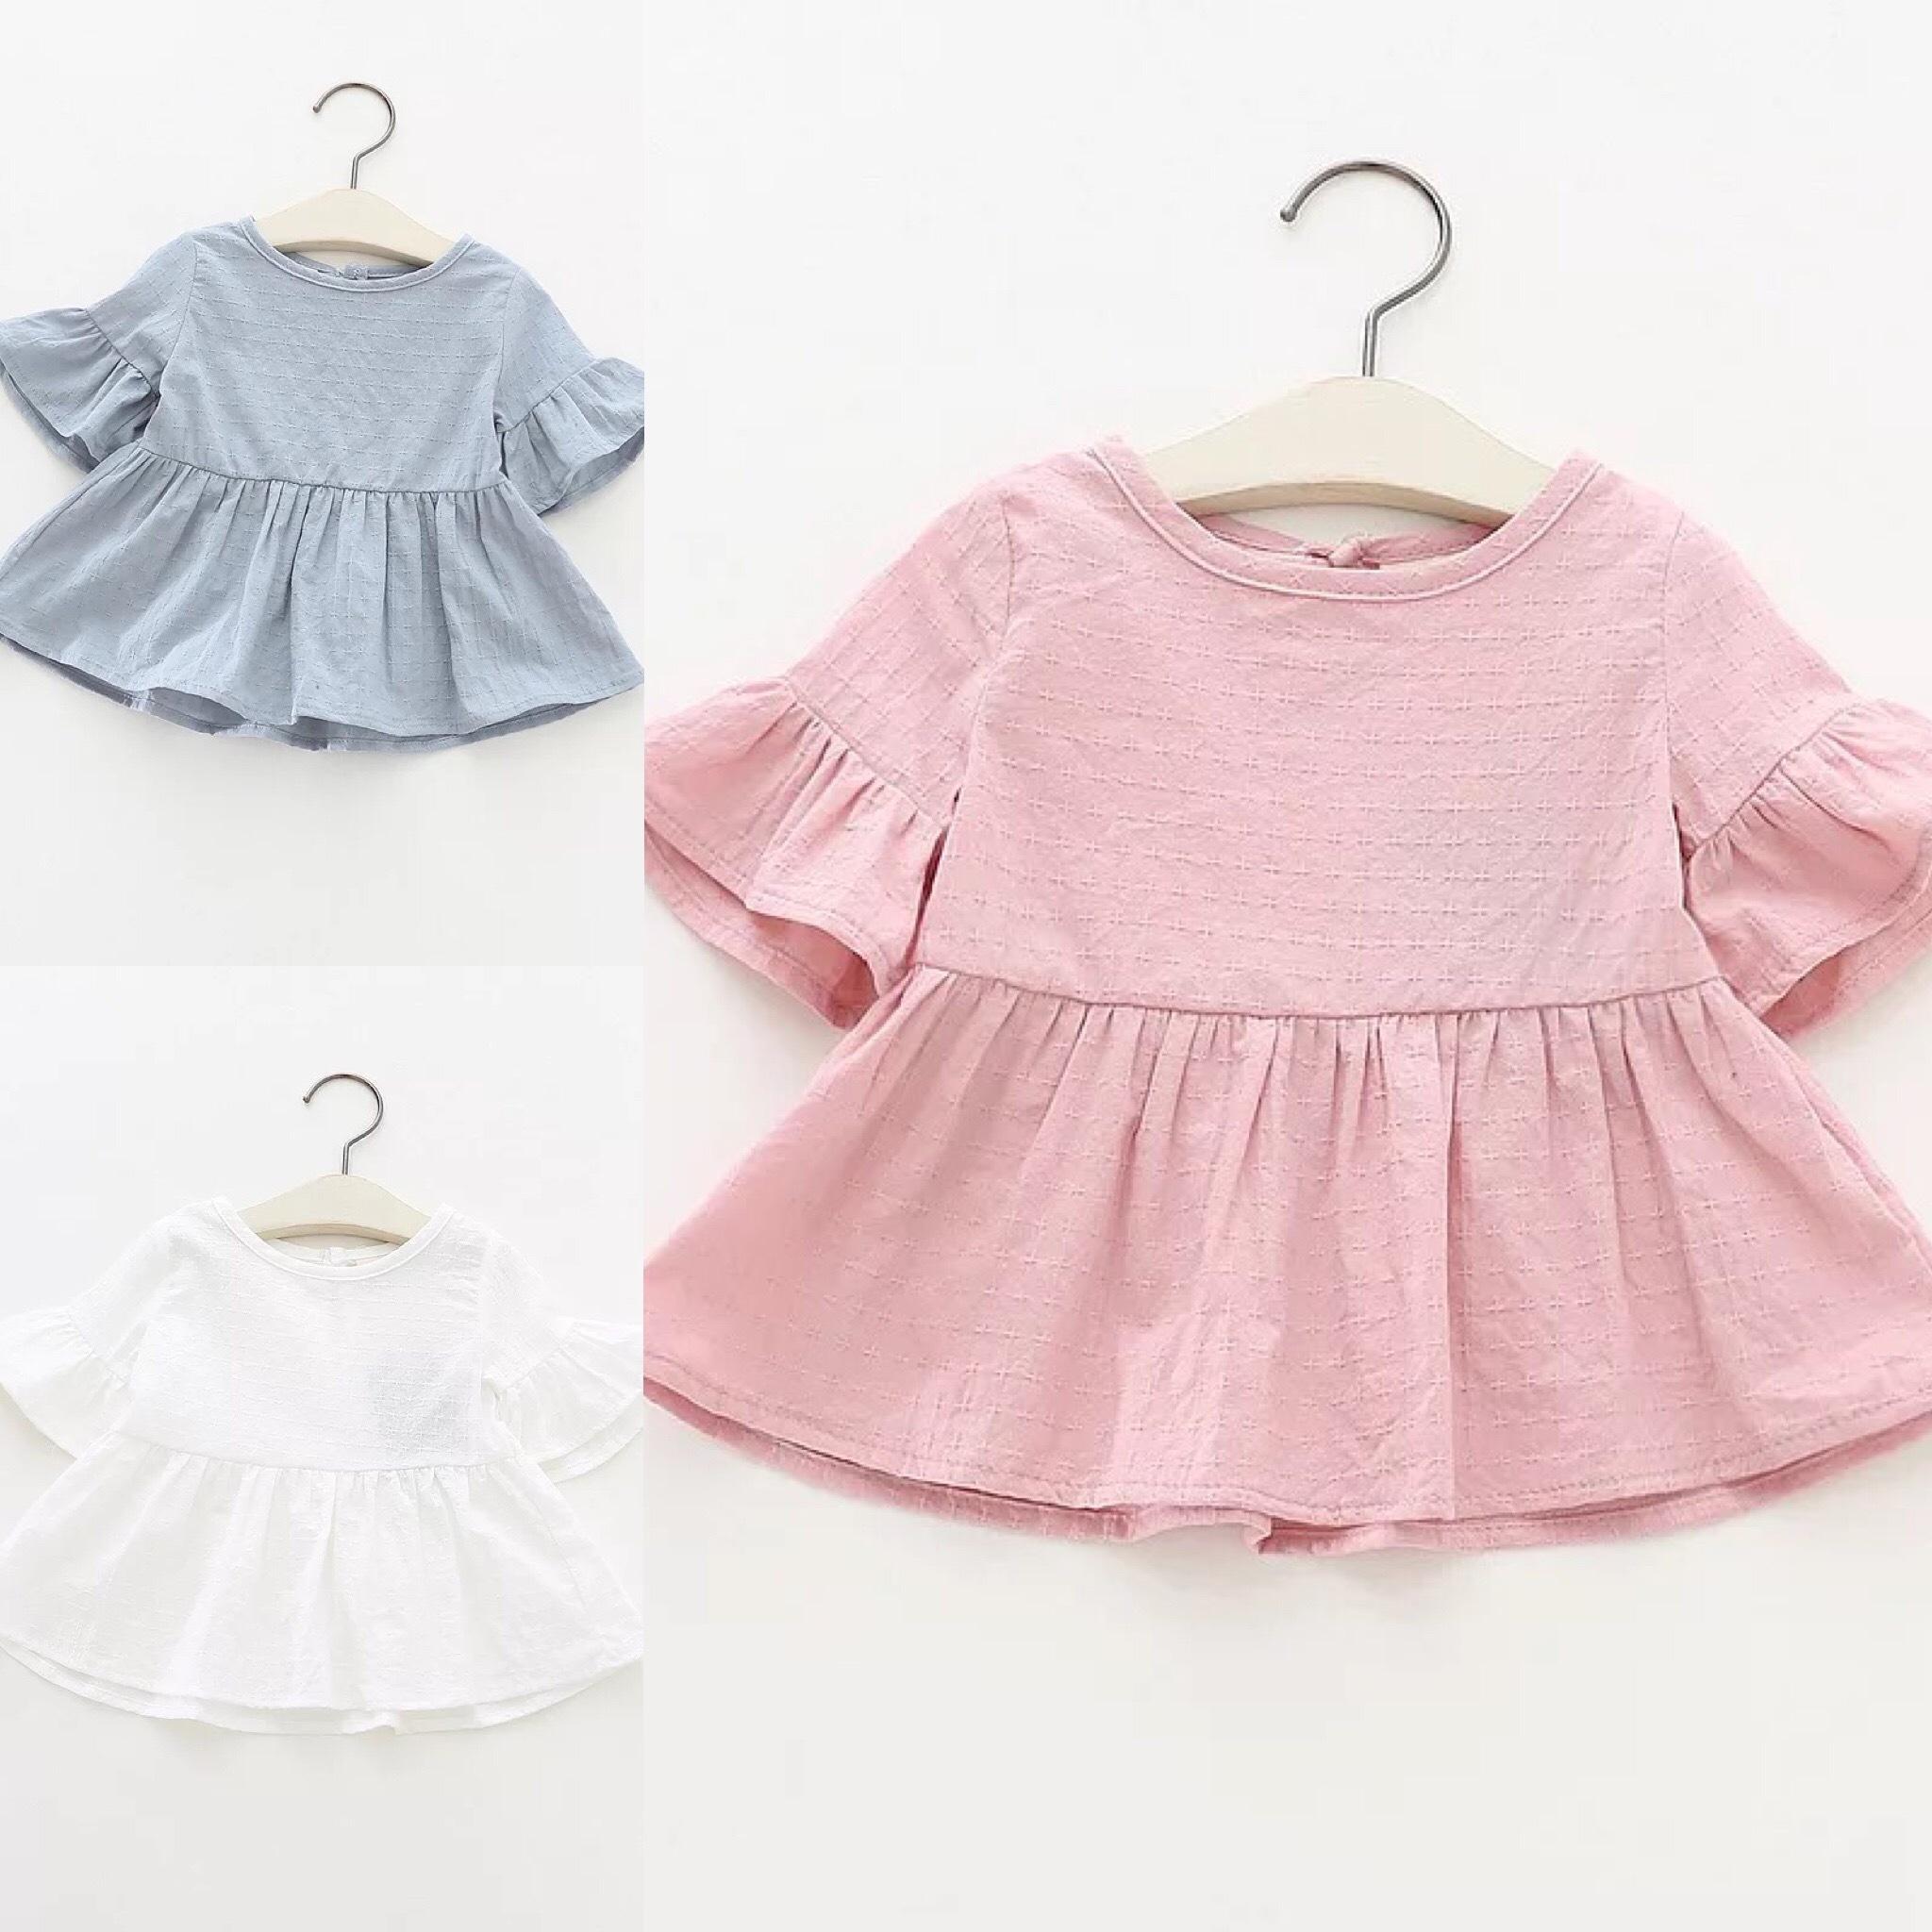 simpleフリルシャツ【523】